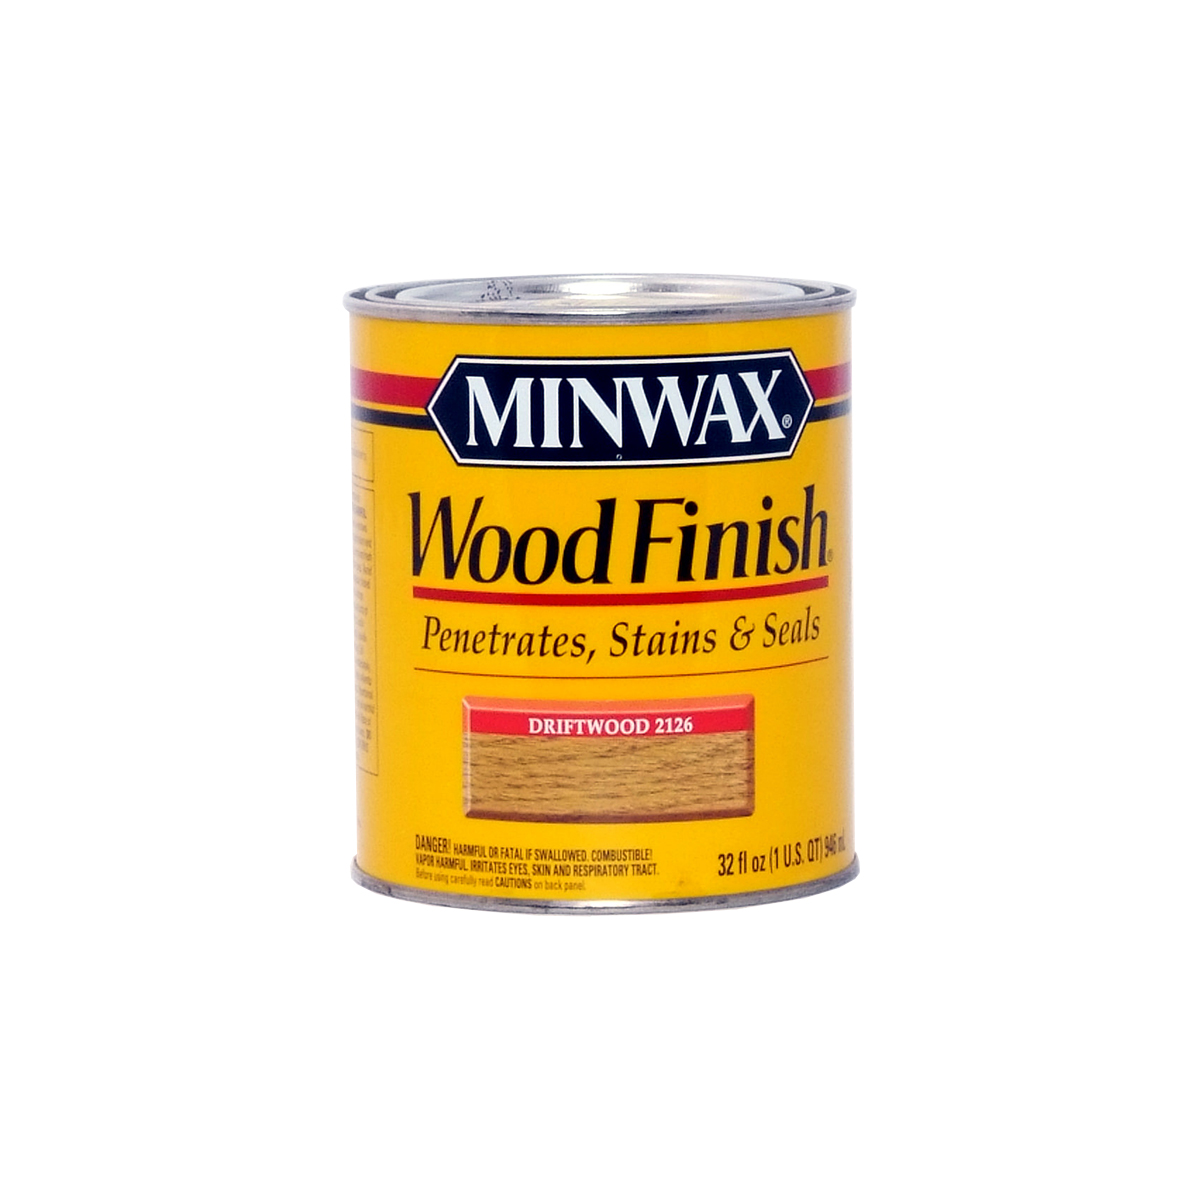 Minwax Driftwood Stain Quart